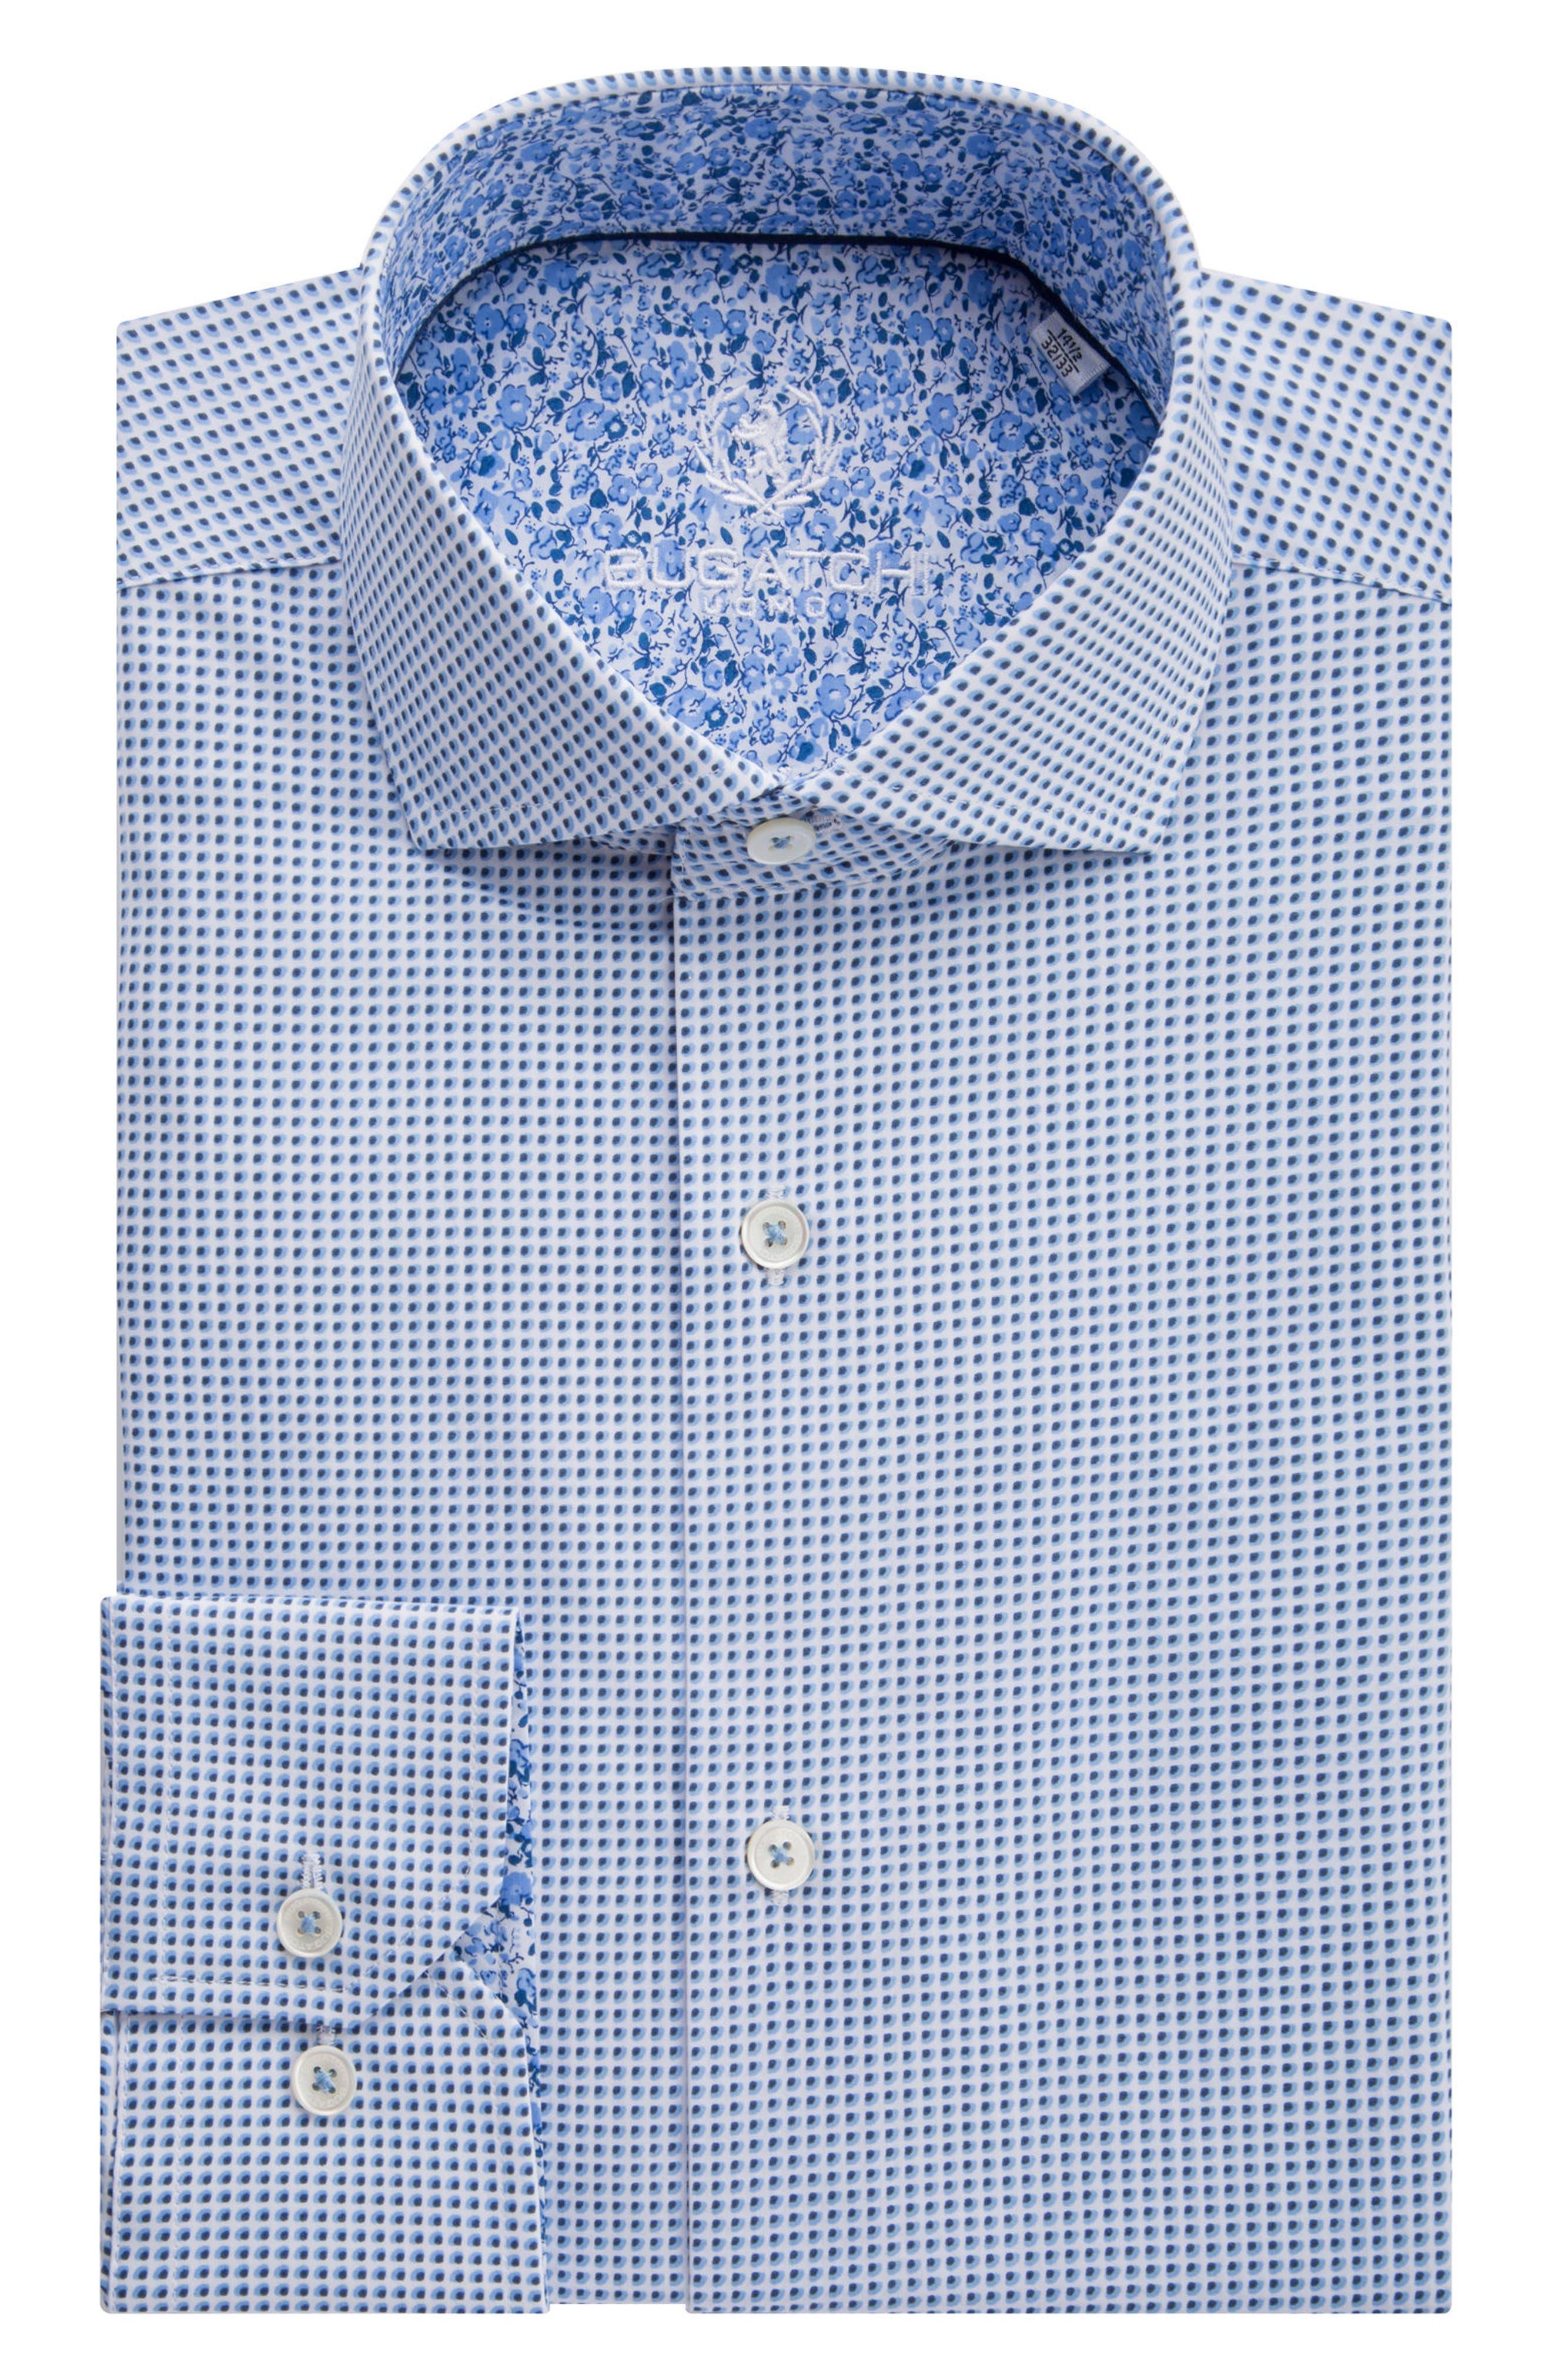 Trim Fit Geometric Dress Shirt,                         Main,                         color, Classic Blue